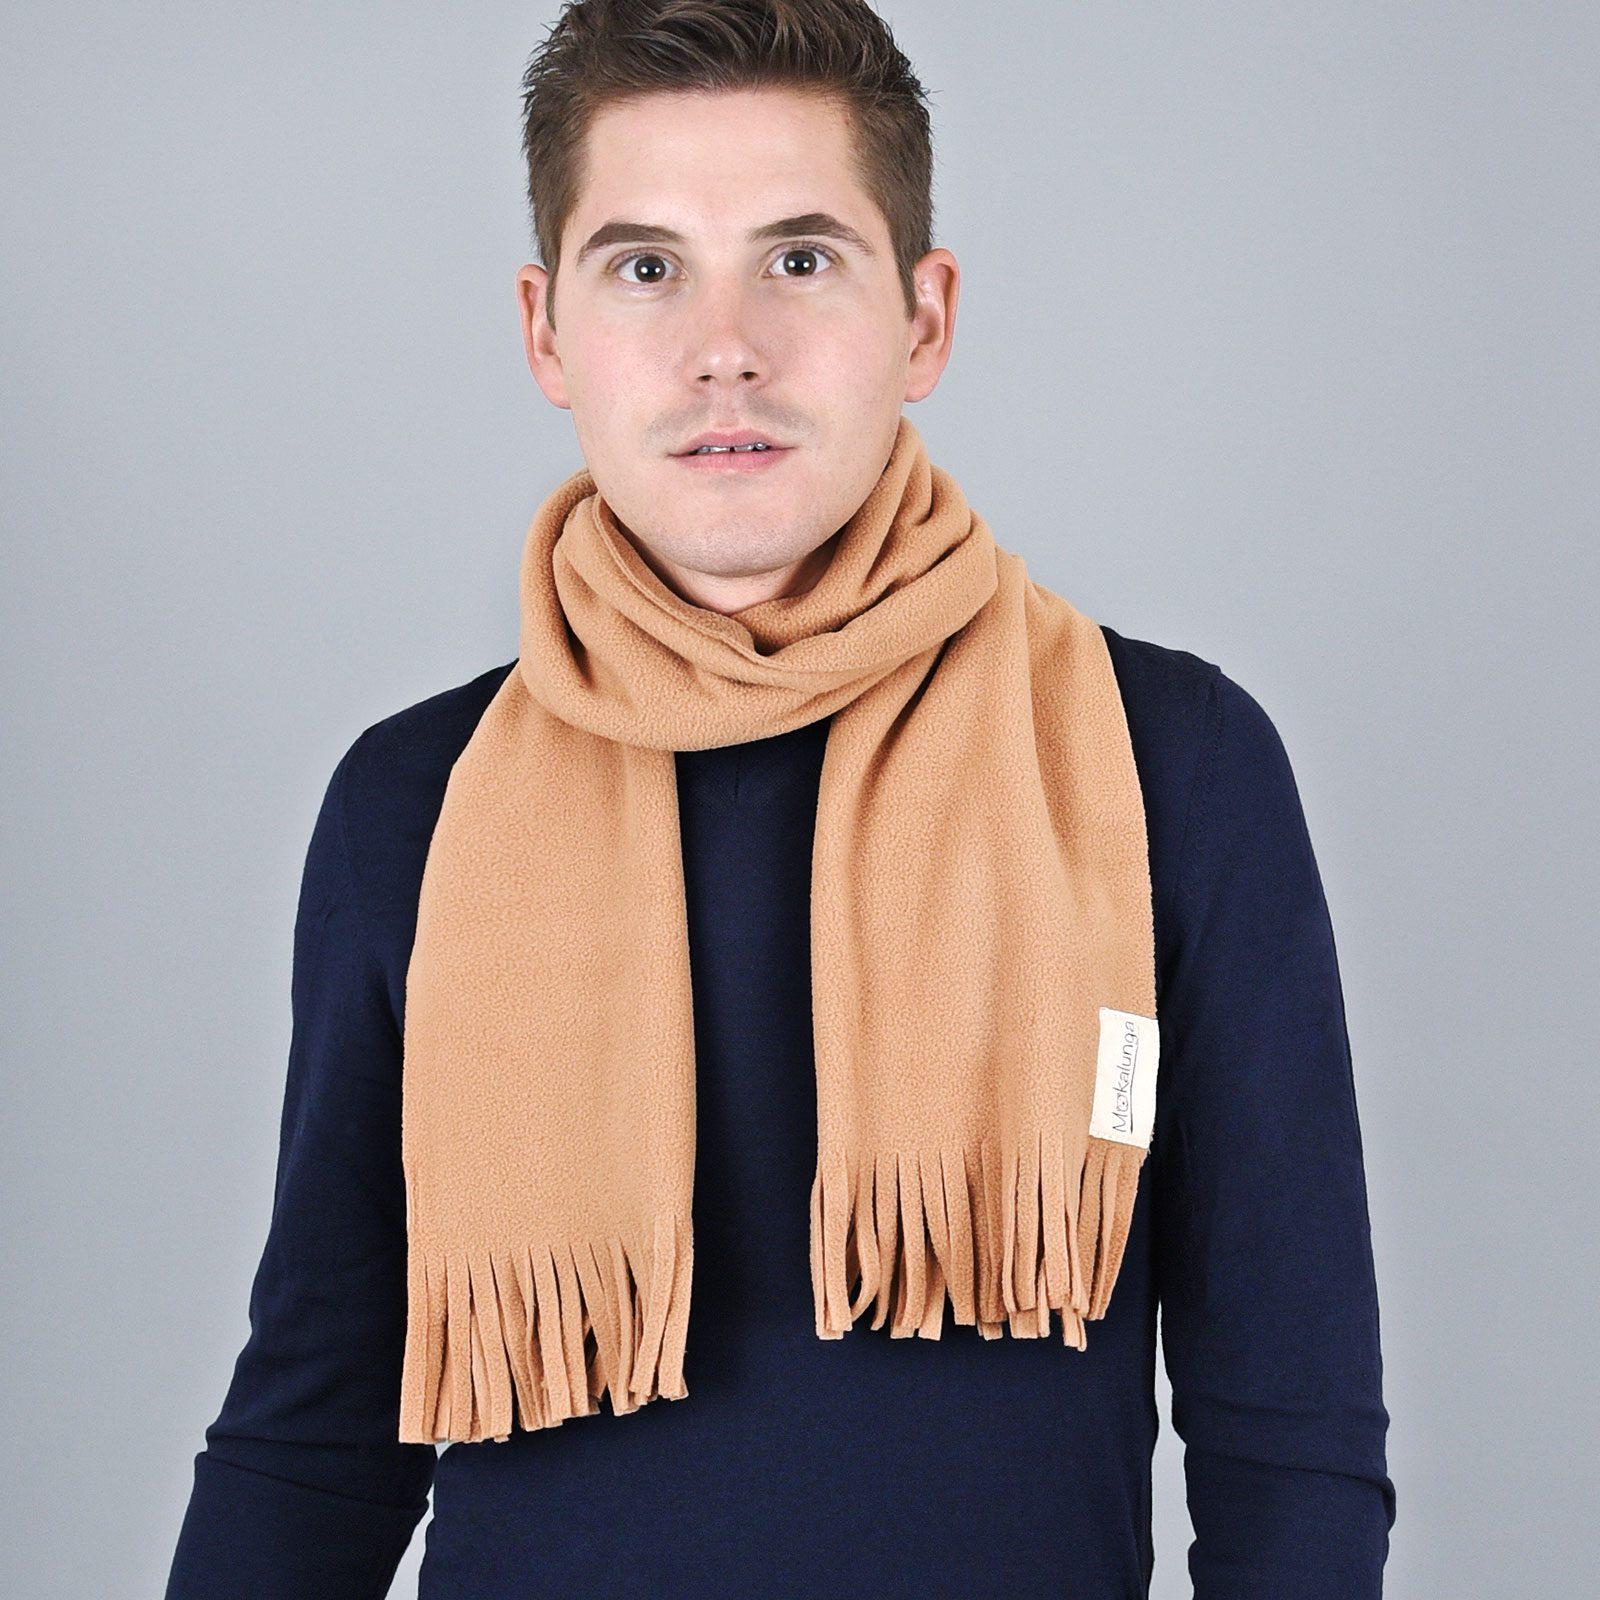 http://lookbook.allee-du-foulard.fr/wp-content/uploads/2018/11/AT-01751-VH16-1-echarpe-polaire-homme-camel-1600x1600.jpg